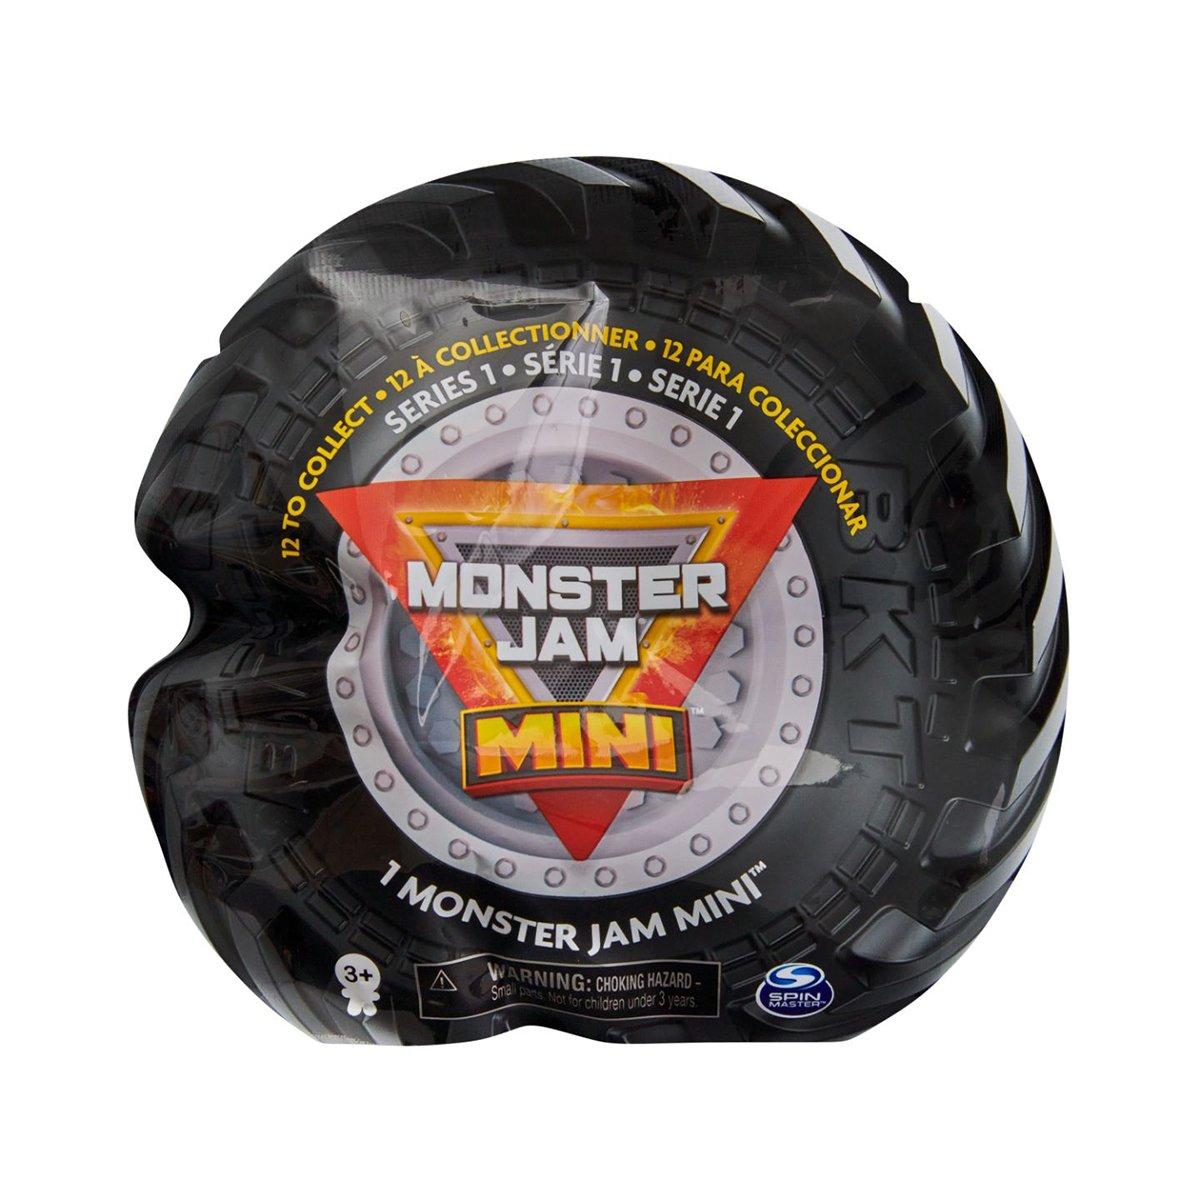 Pachet surpriza, Monster Jam, Mini Masina